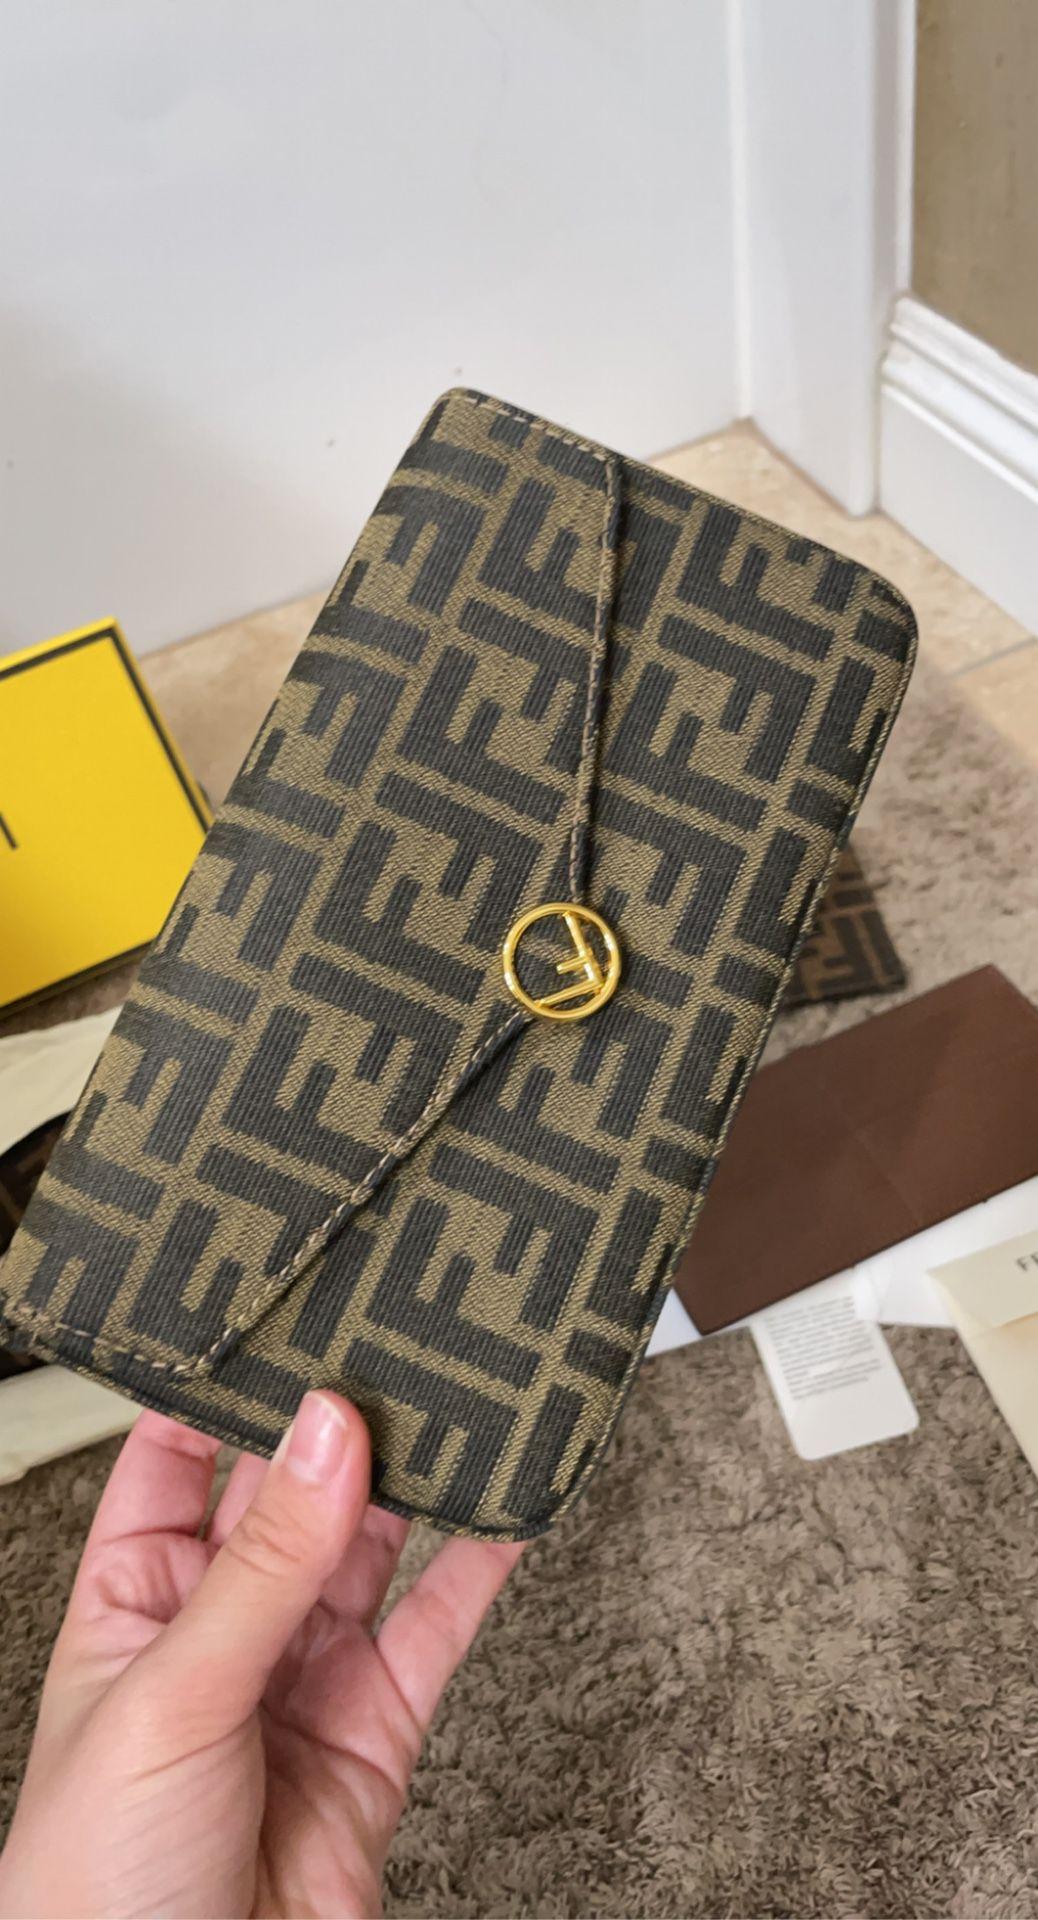 Fendi Baguette Wallet Bag